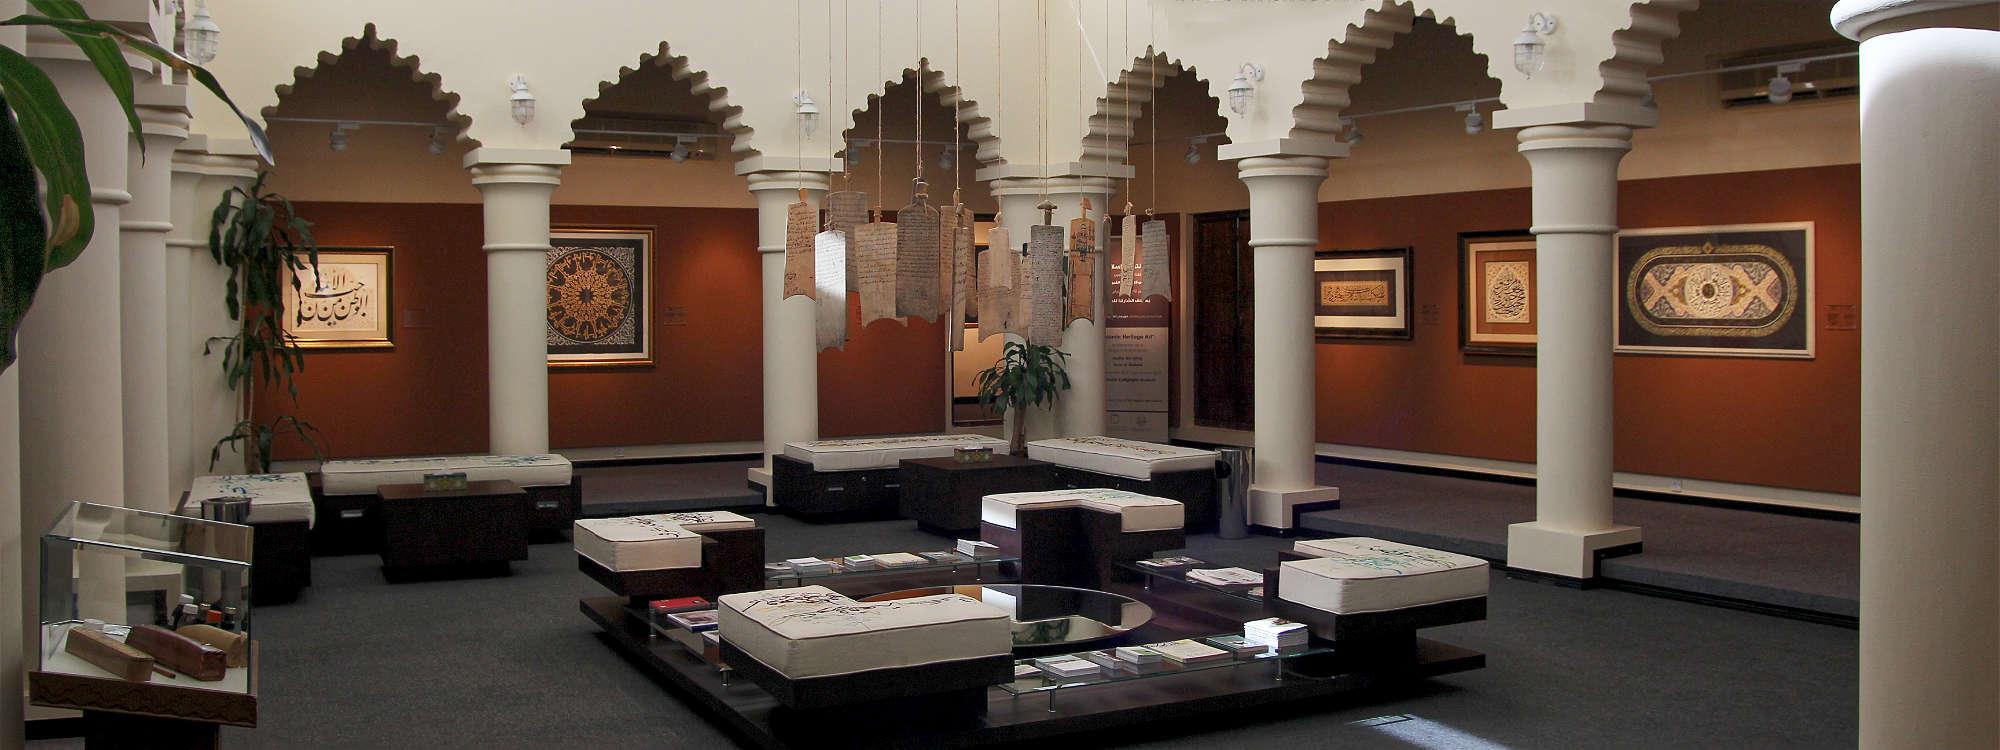 Kalligrafie Museum Sharjah